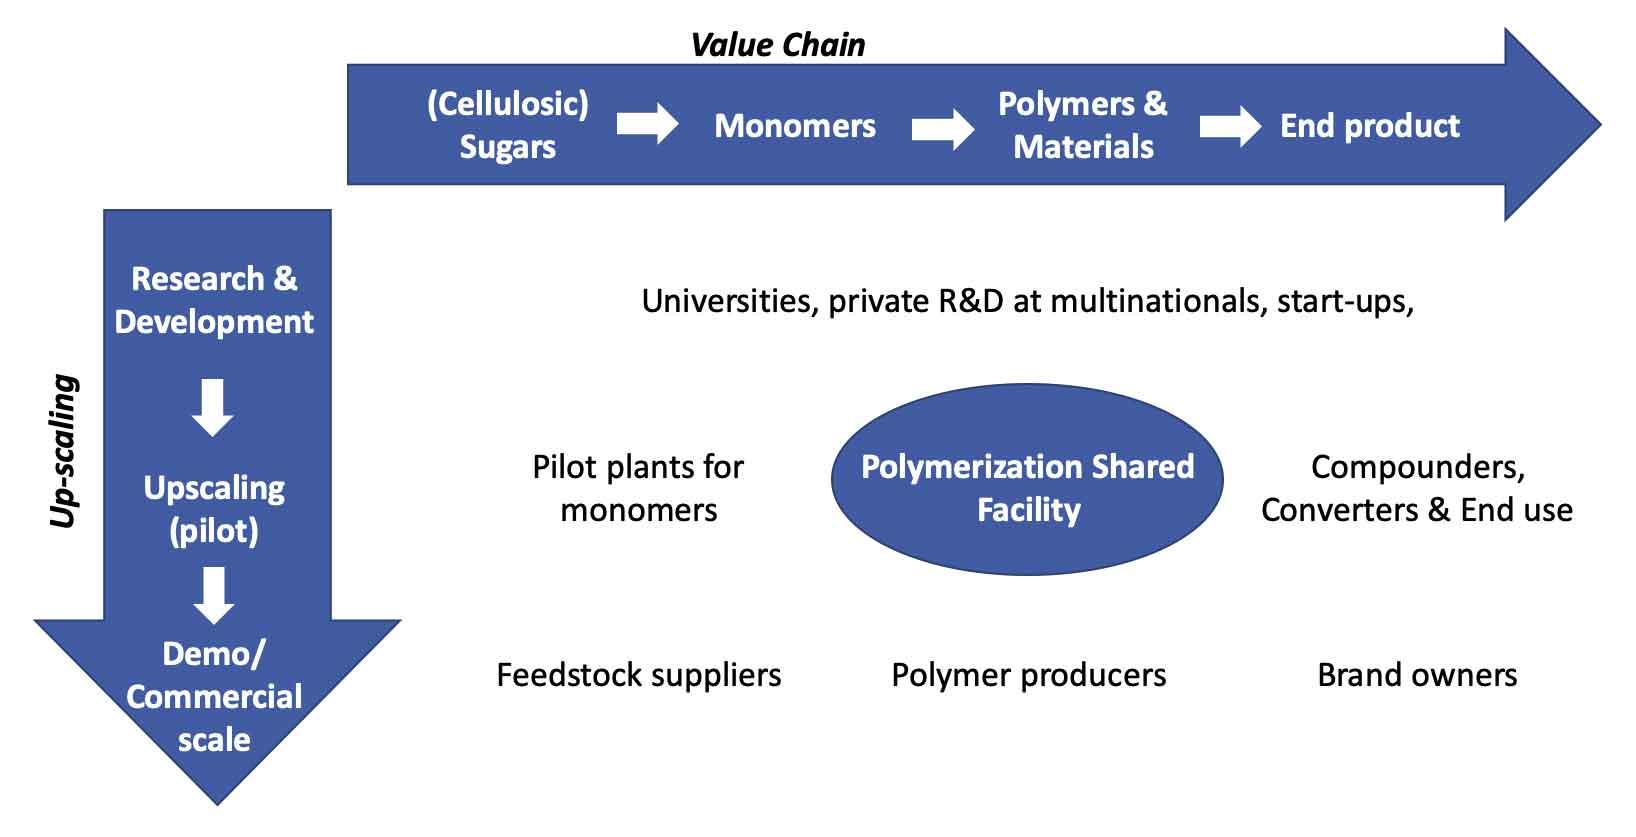 Diagram Polymerization Shared Facility